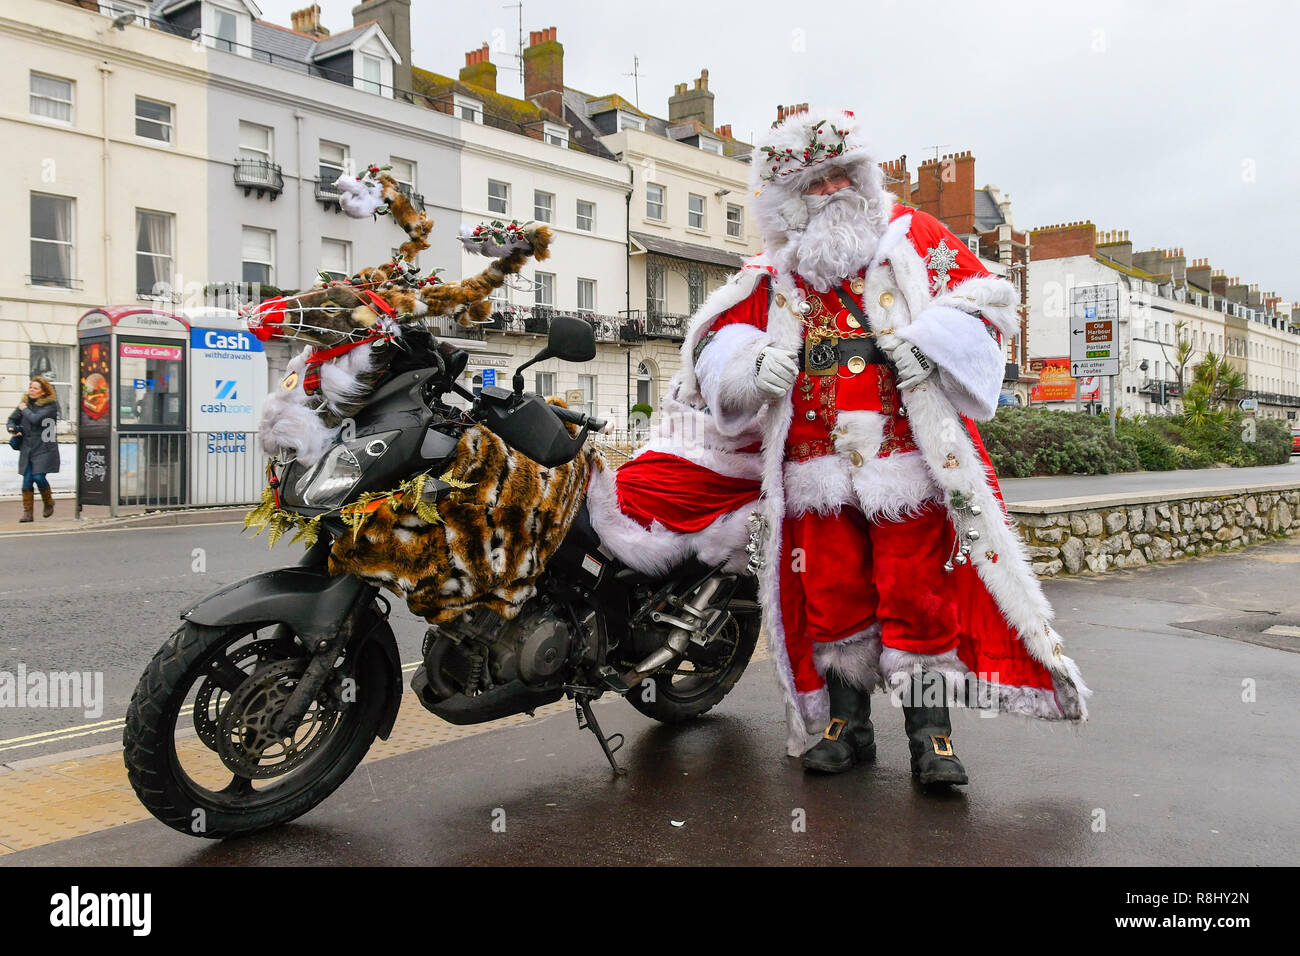 Biker Christmas.Weymouth Dorset Uk 16th December 2018 Father Christmas